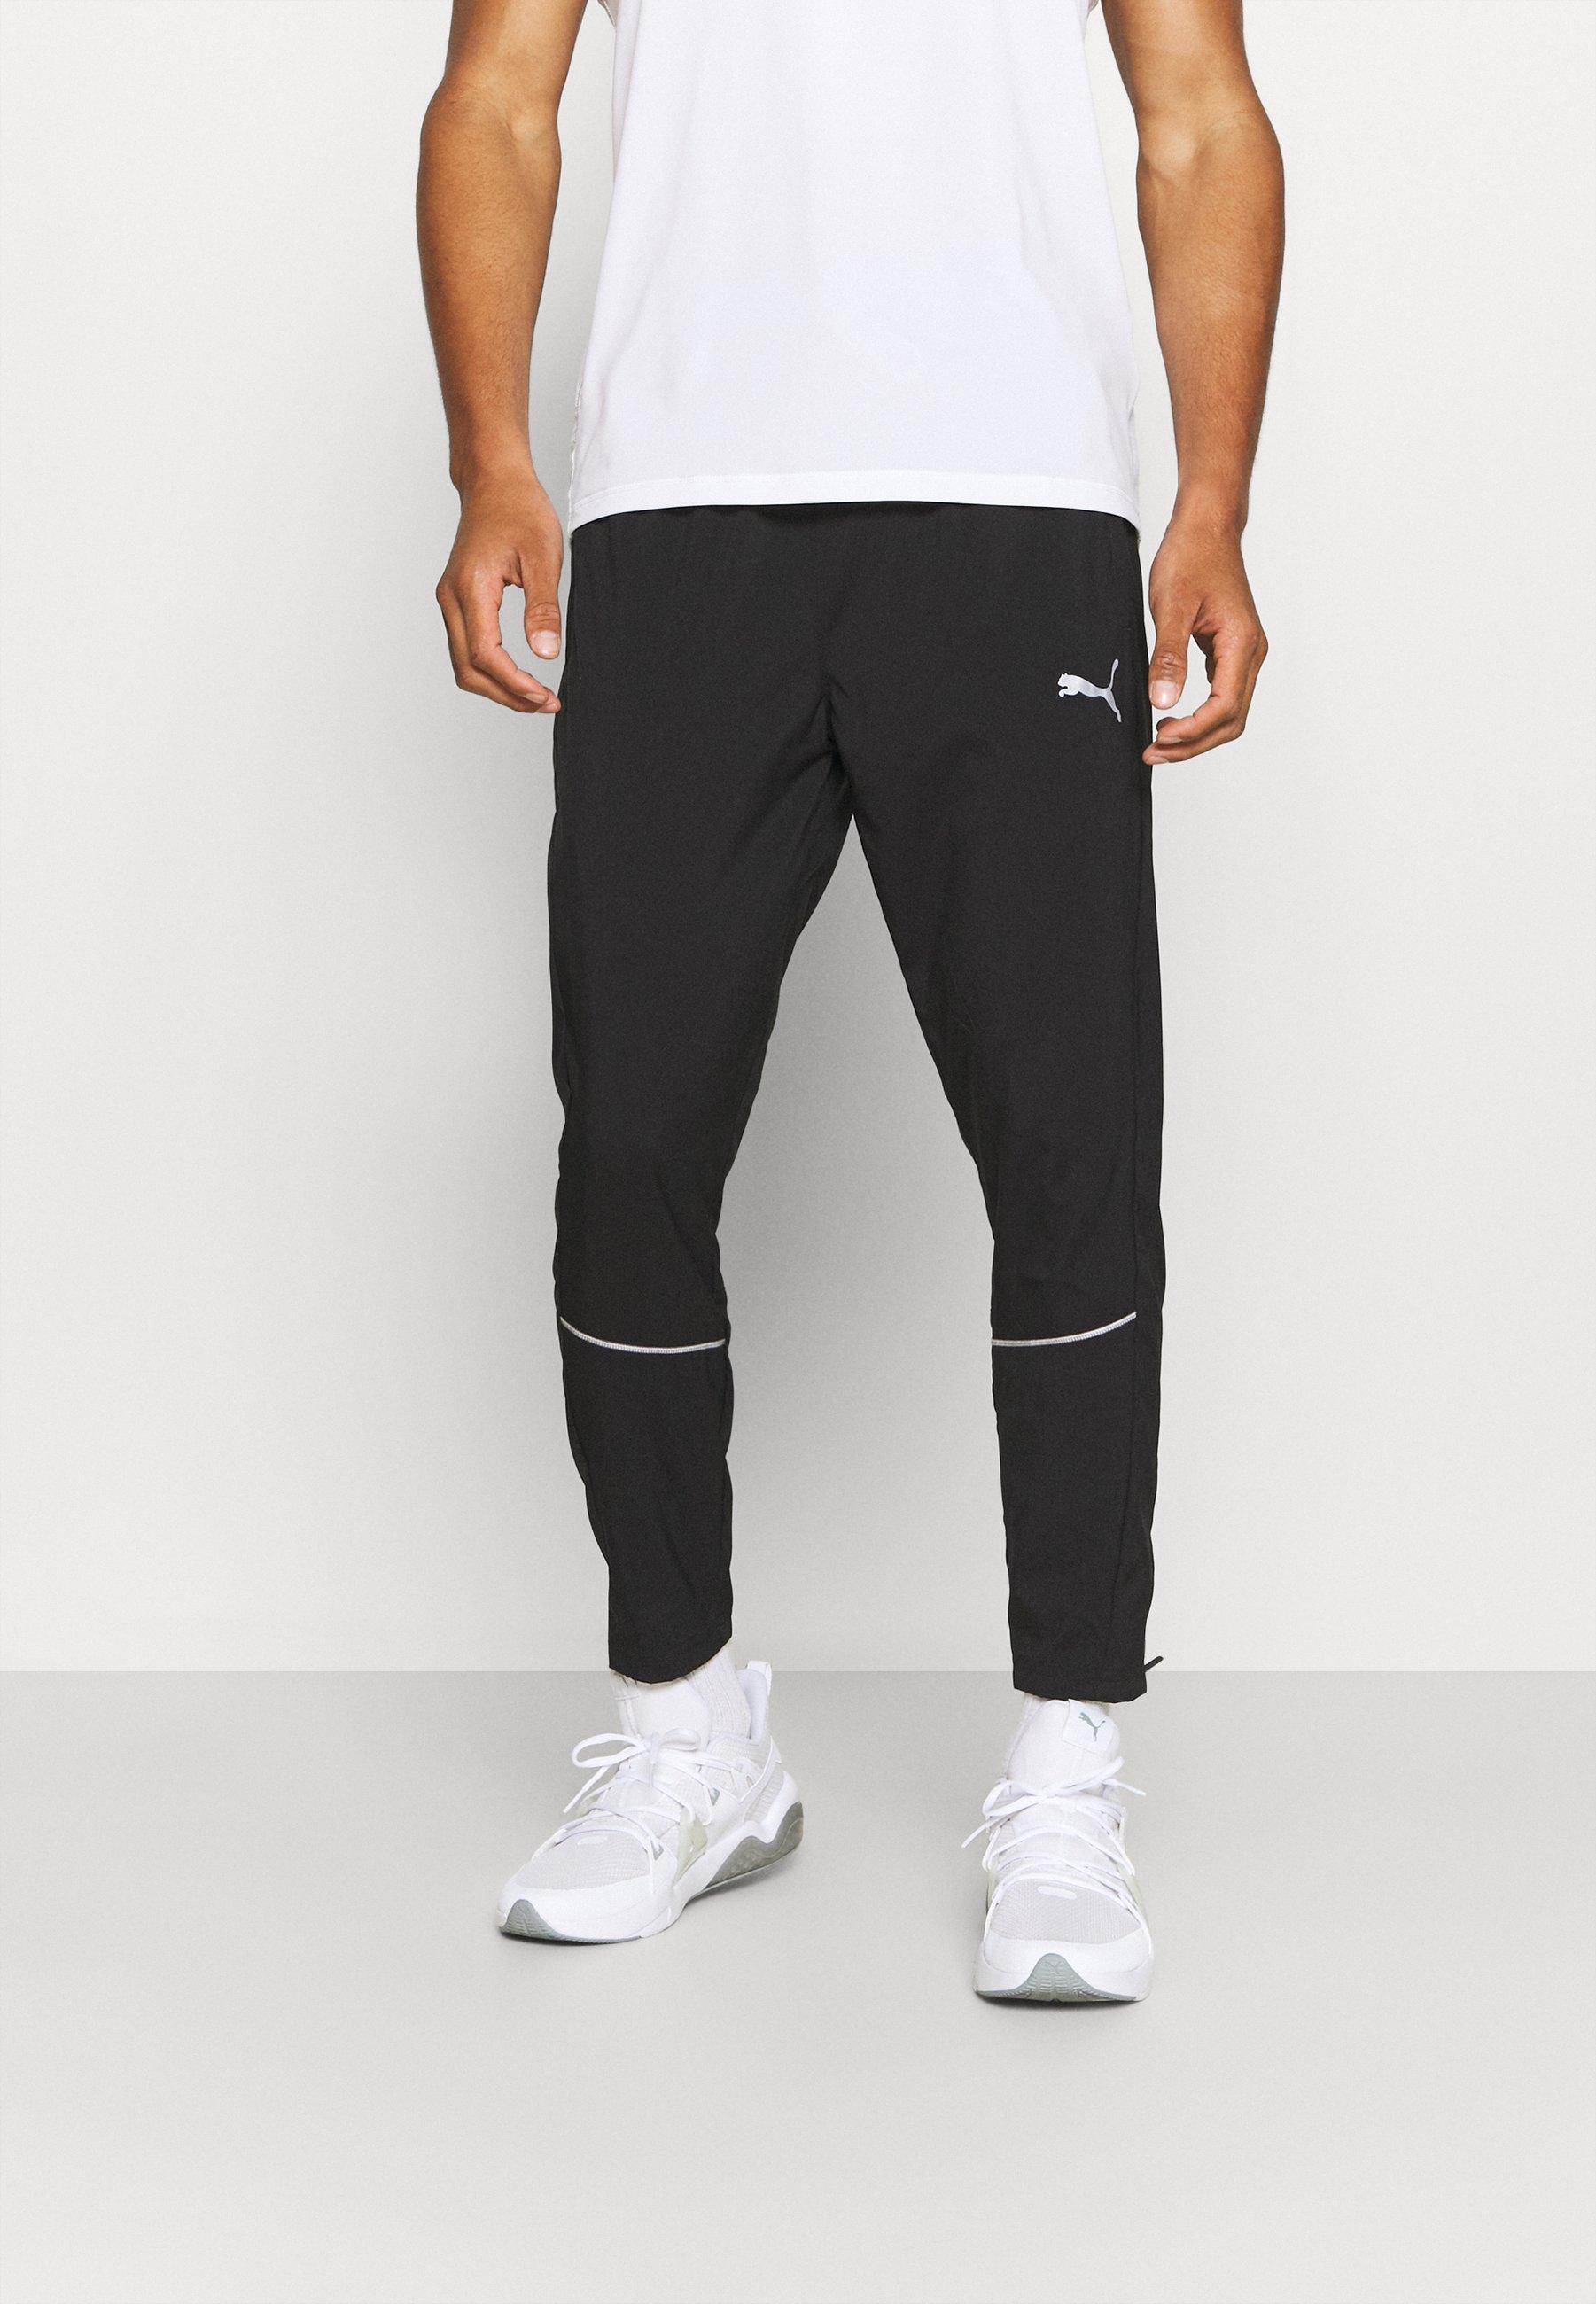 Uomo RUN TAPERED PANT - Pantaloni sportivi